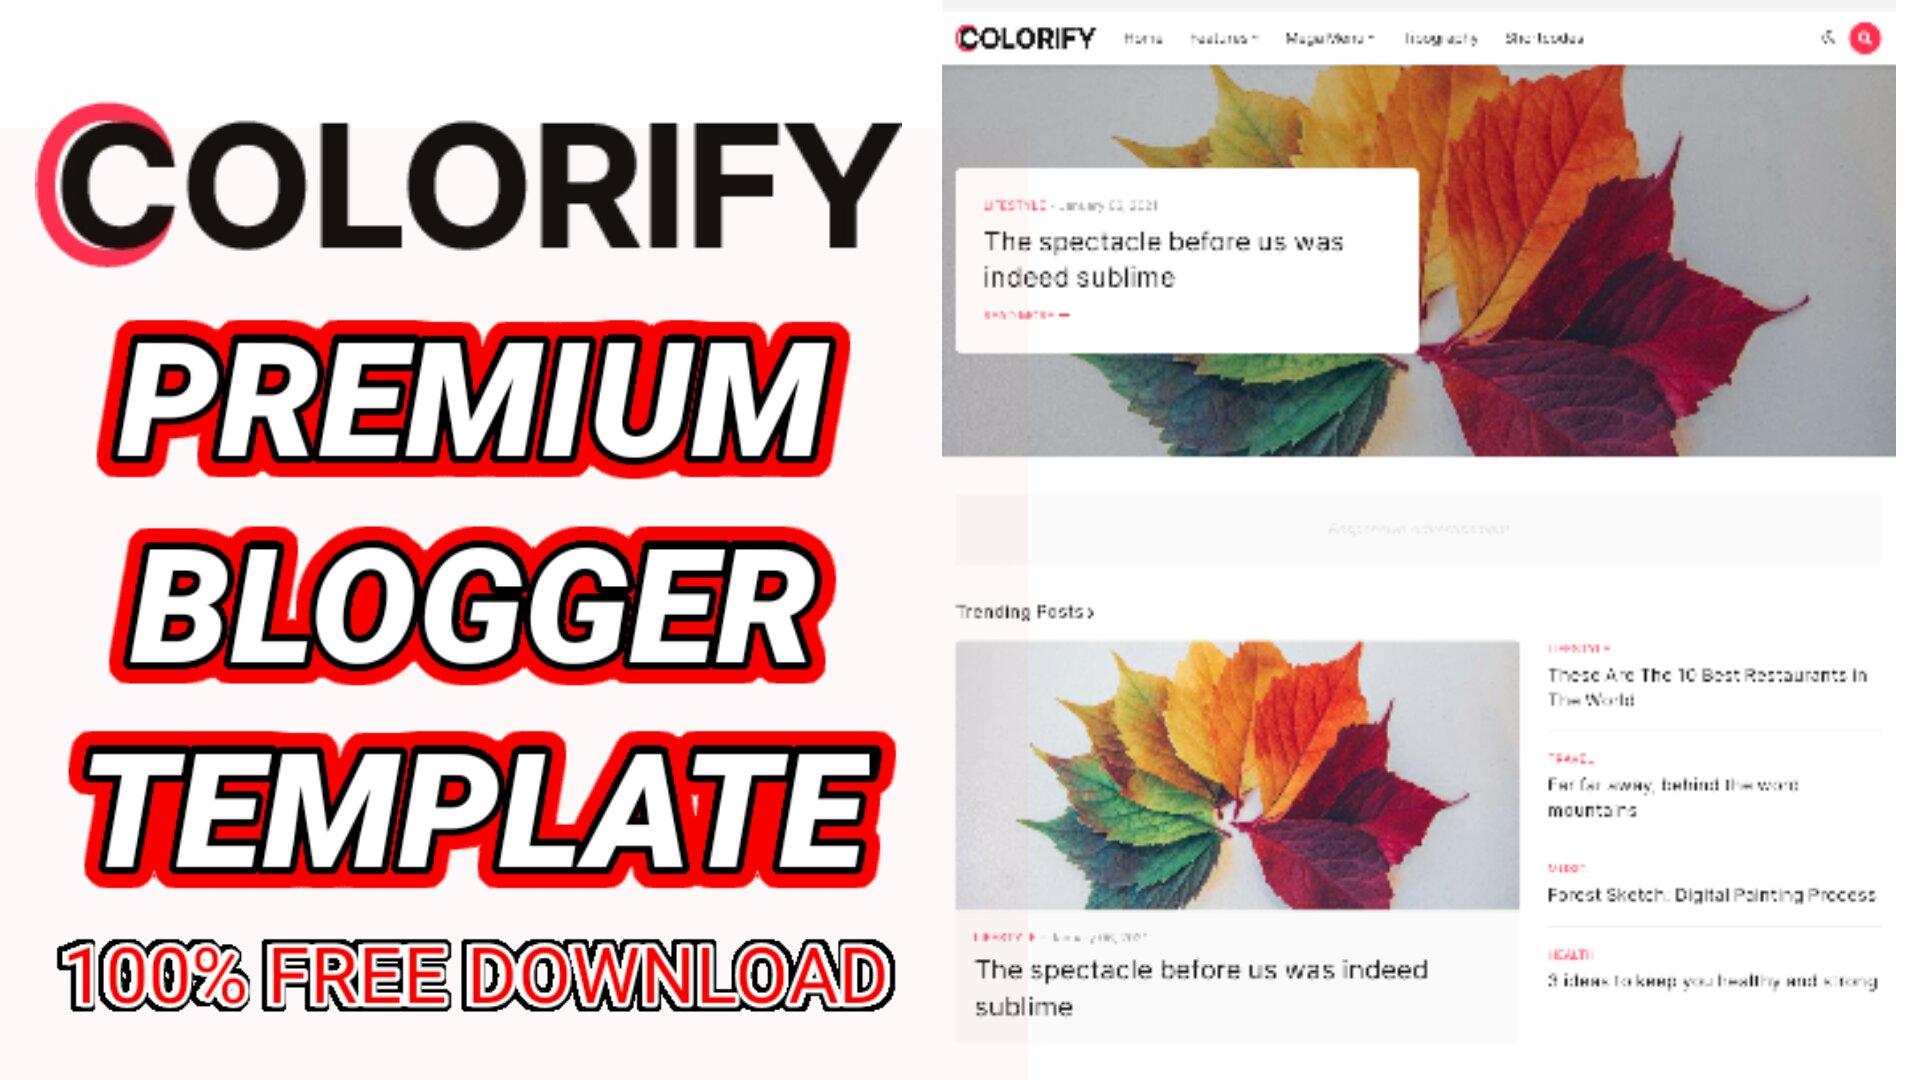 Colorify Premium Creative Blogger Template (Free Downlaod)